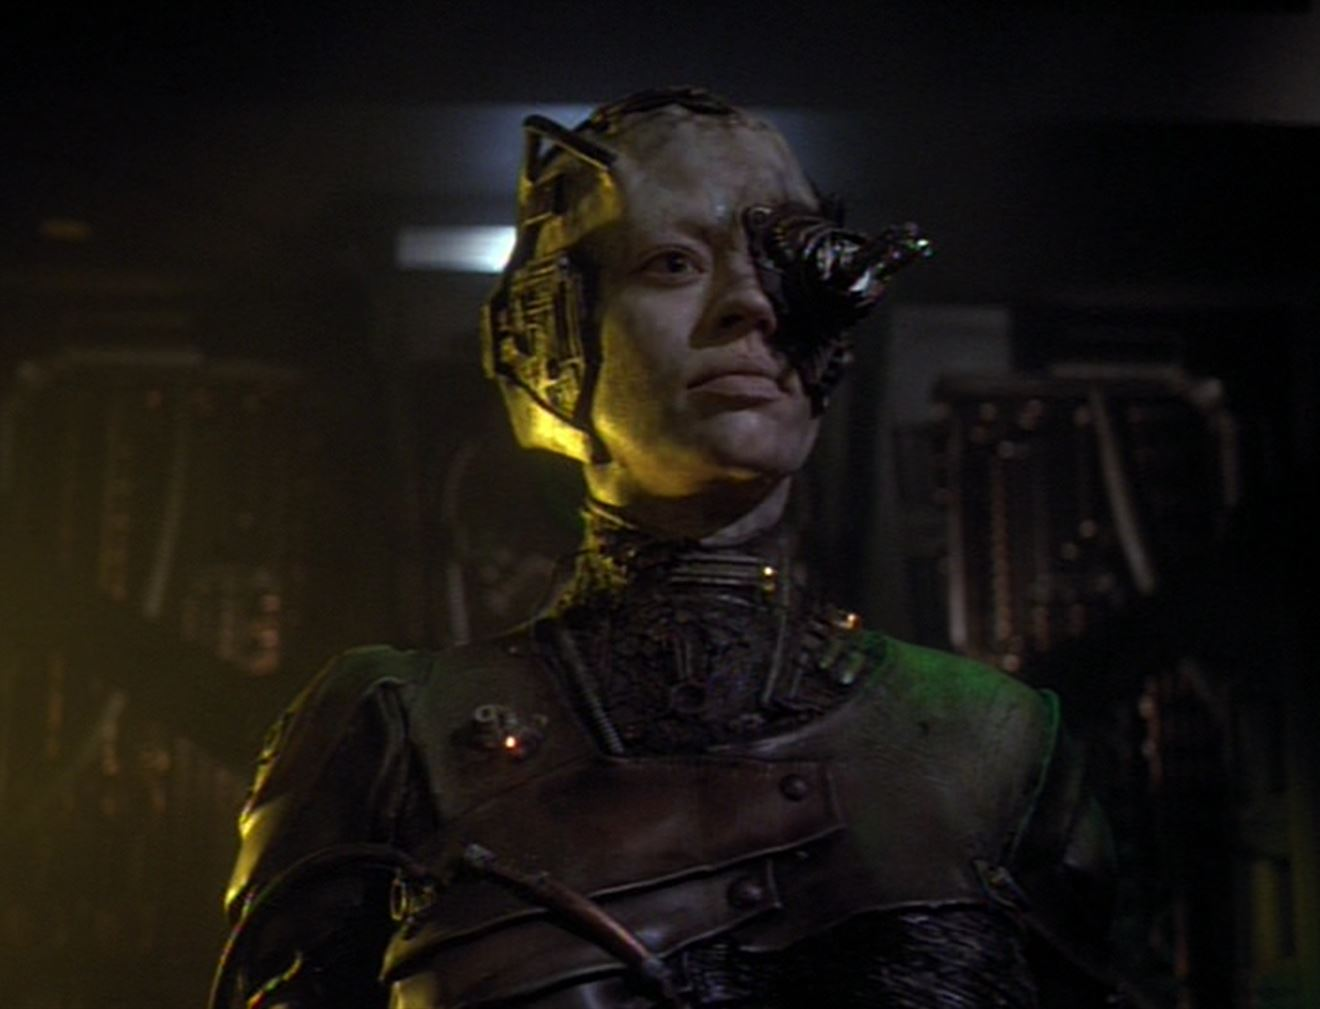 Alternate Timeline Star Trek Voyager Porno with Evil Seven